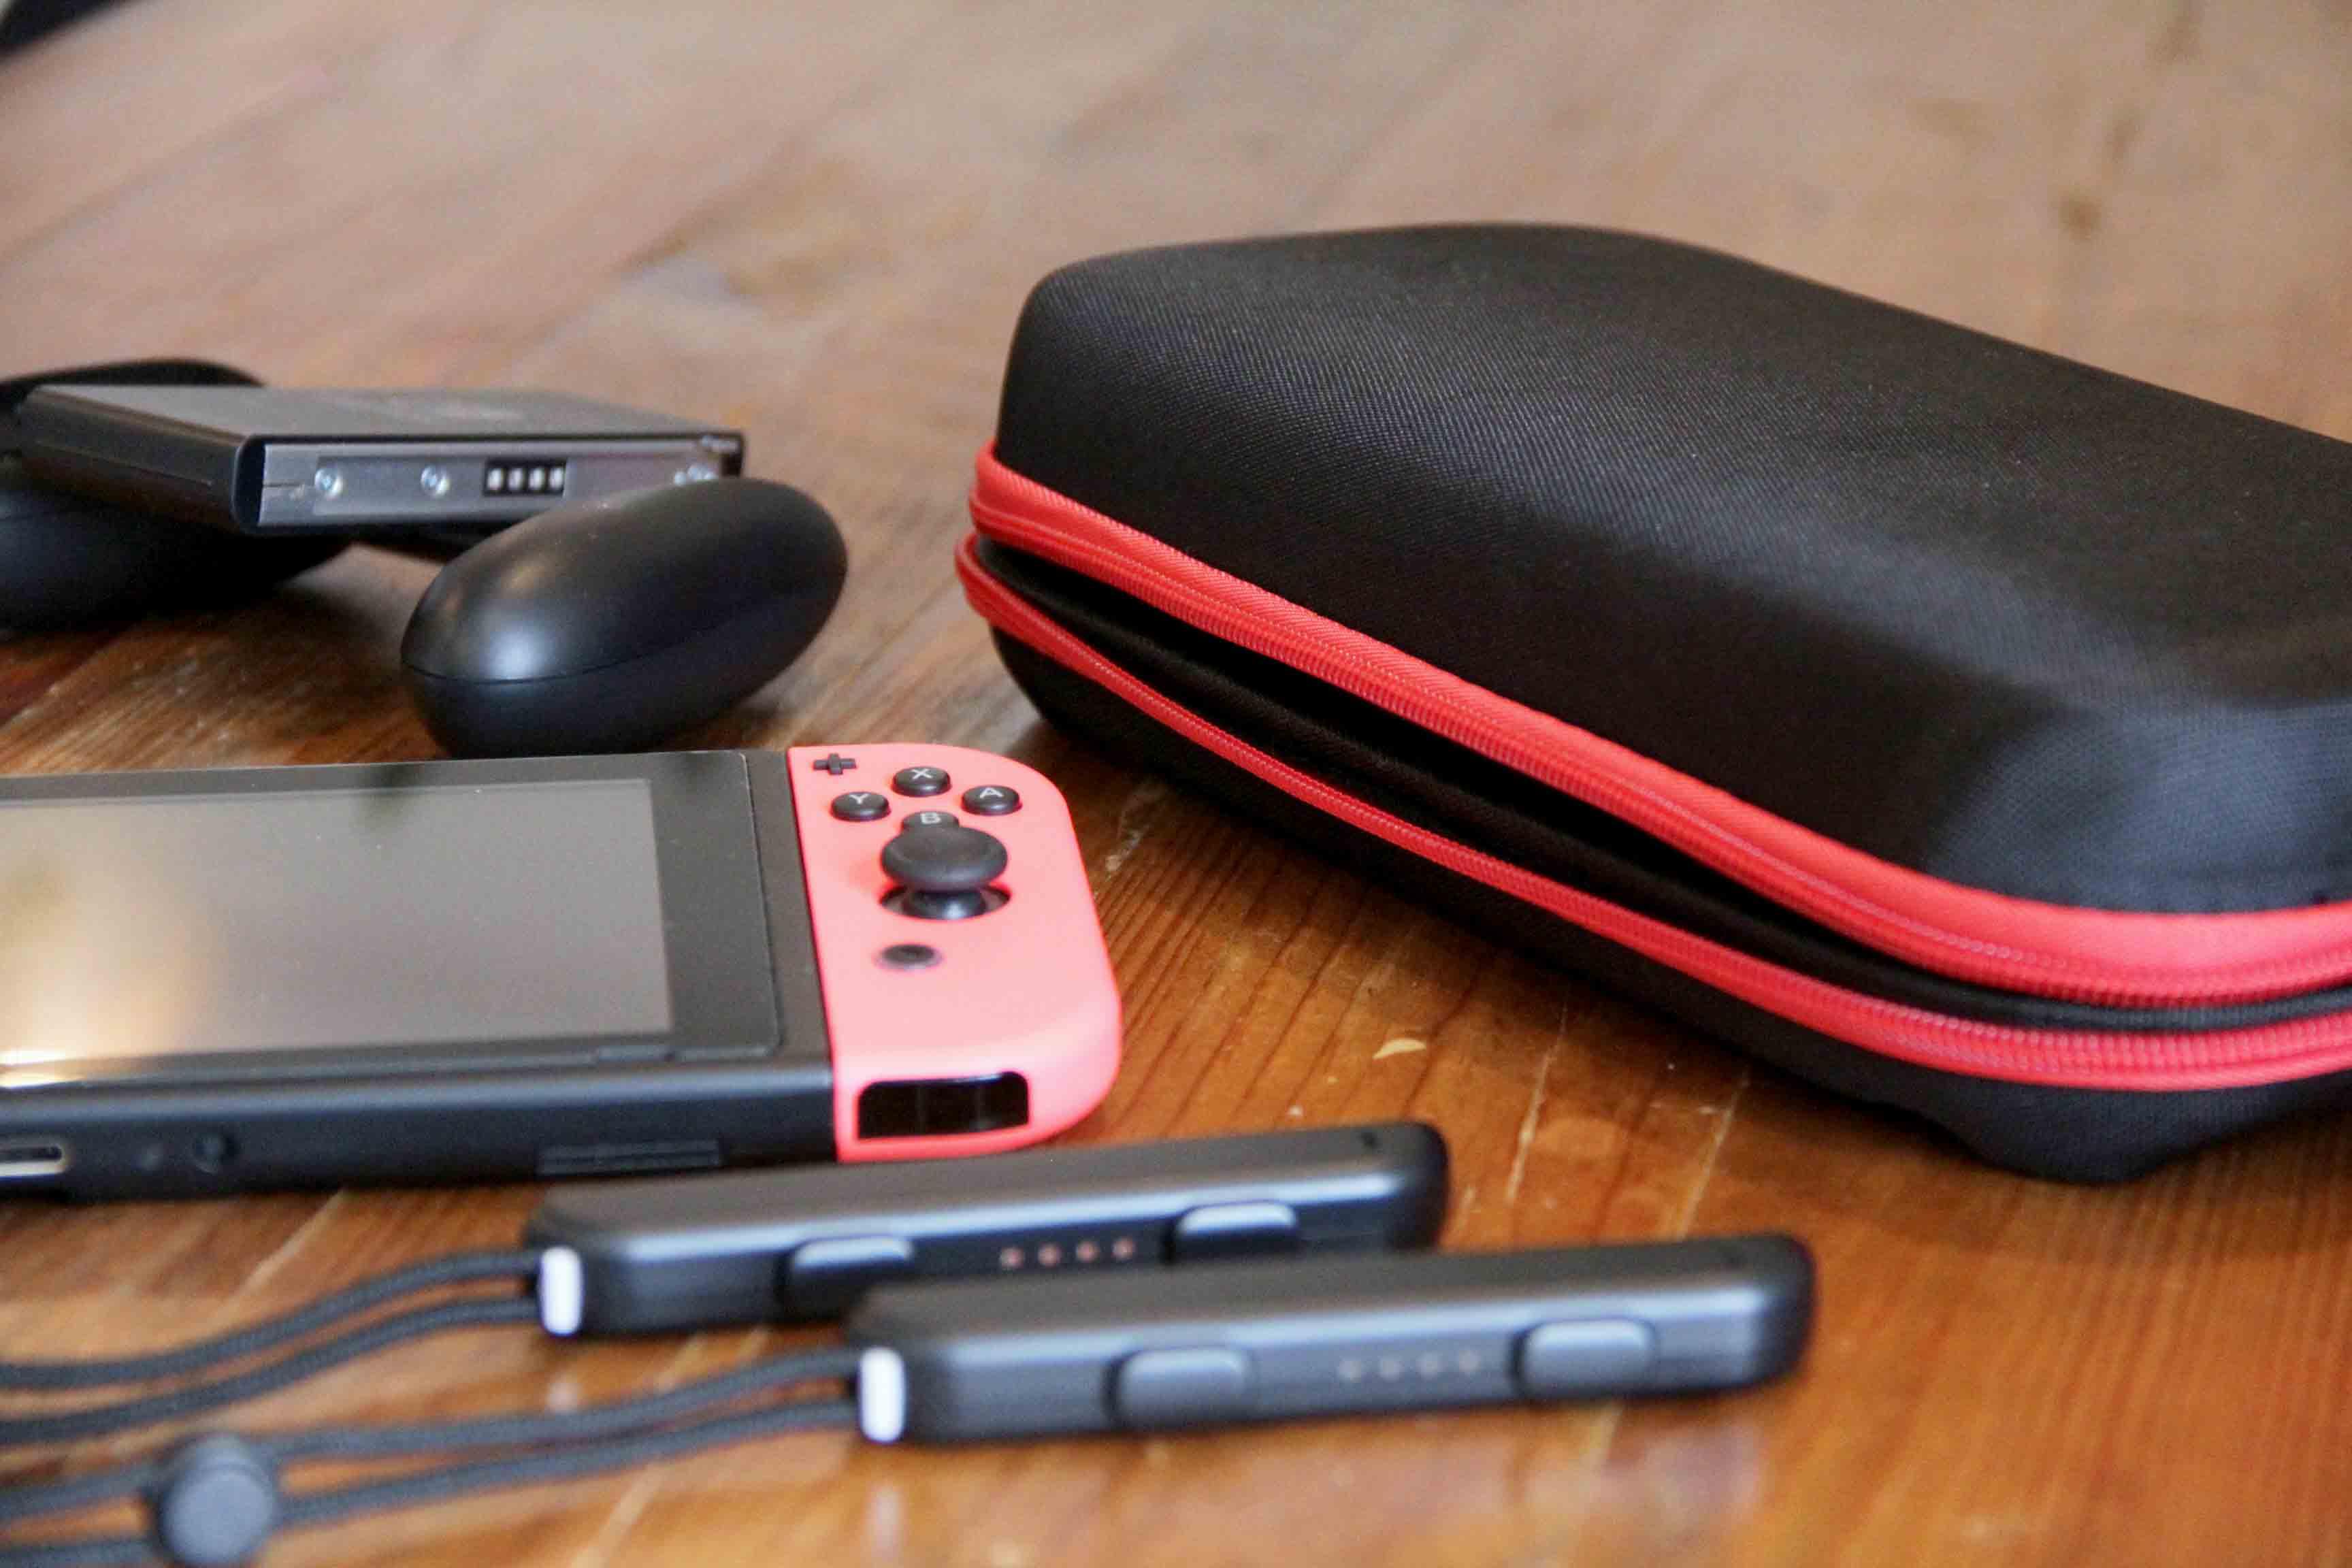 Nintendo switch保護キャリングケース/ハードケースの写真